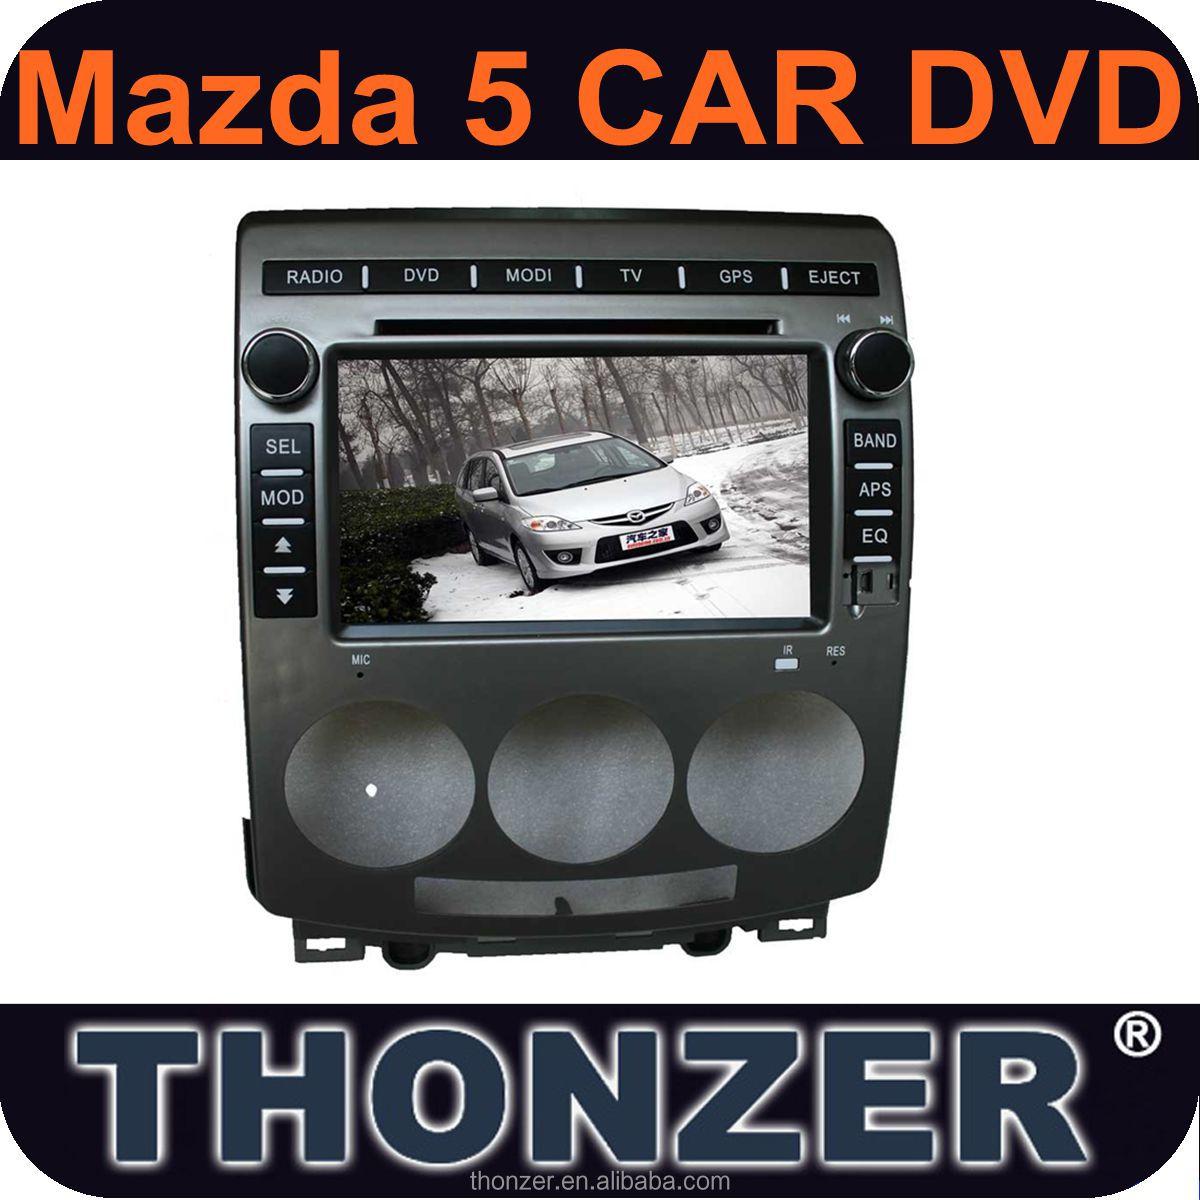 Mazda 5 car radio mazda 5 car radio suppliers and manufacturers at alibaba com